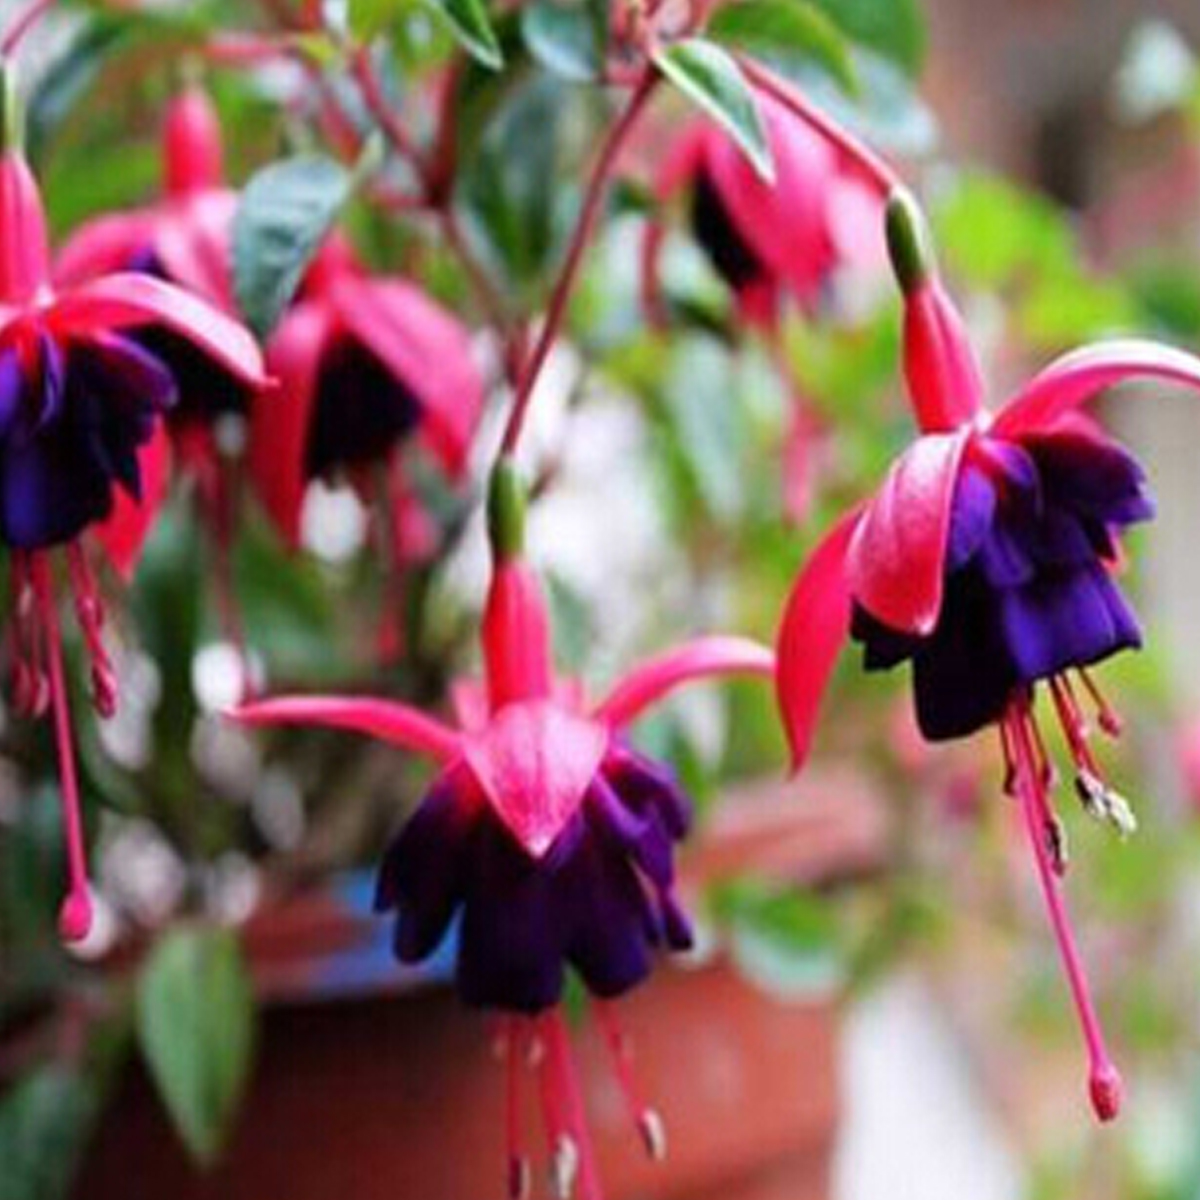 Semi di fiori campana fiore ebay for Semi di fiori